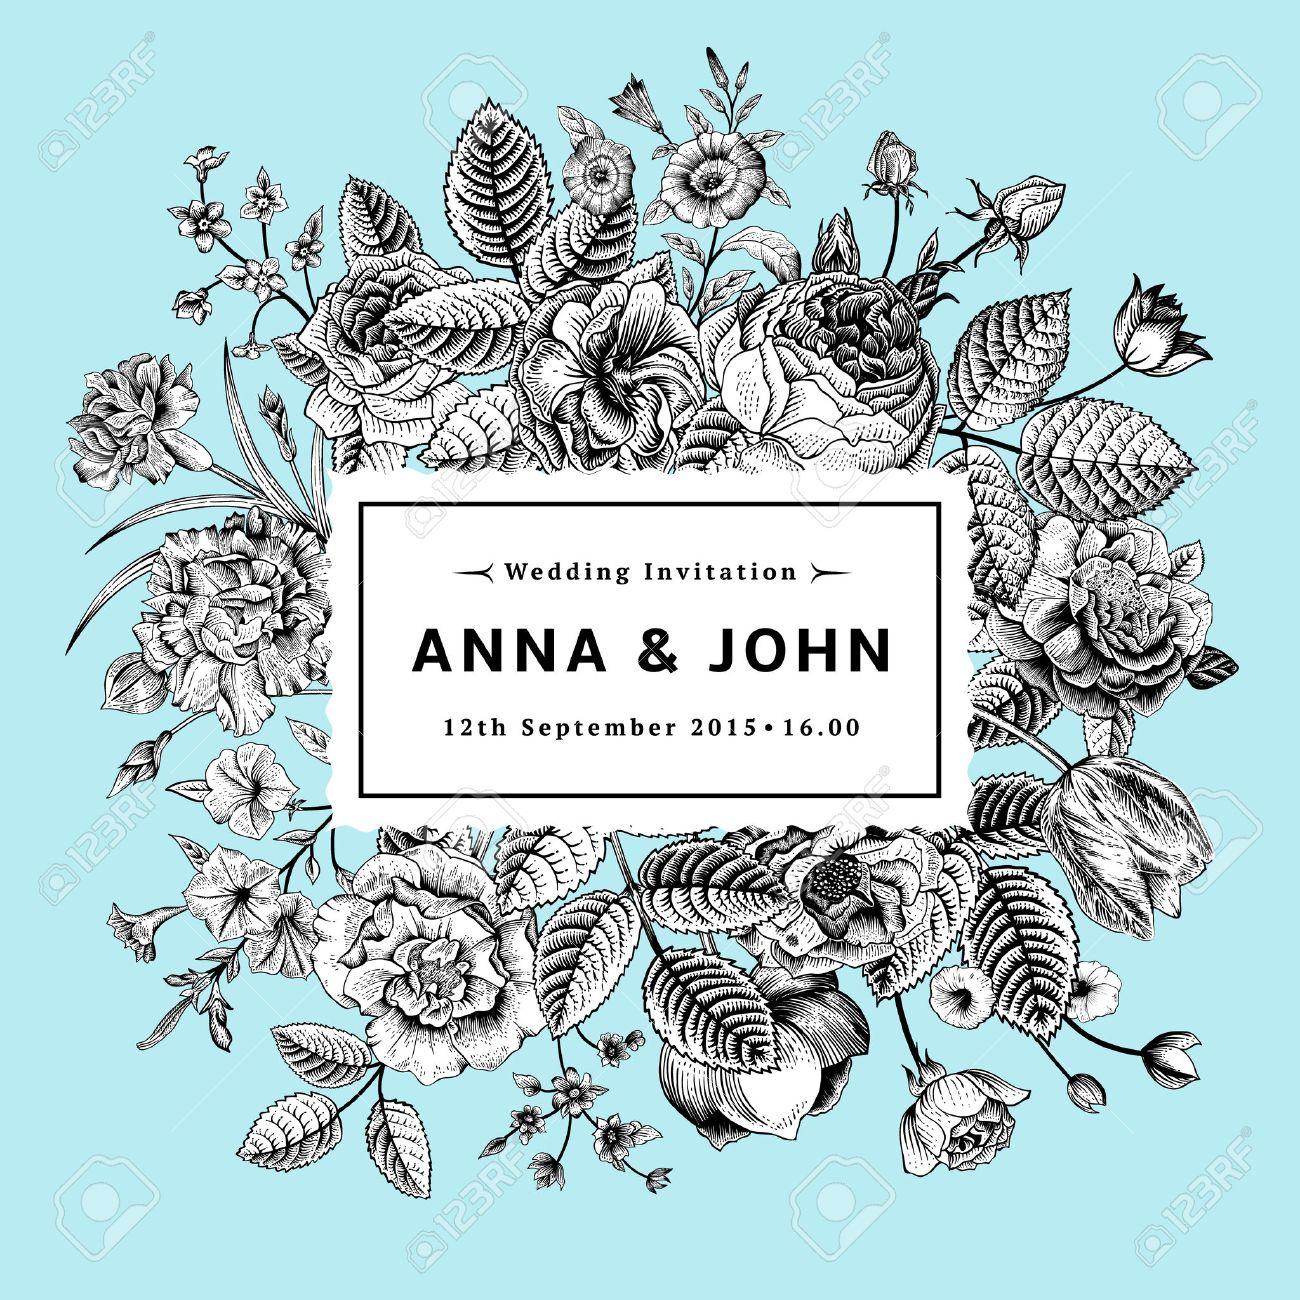 Background image 8841 - Vintage Elegant Wedding Invitation With Black And White Summer Flowers On Mint Background Vector Illustration